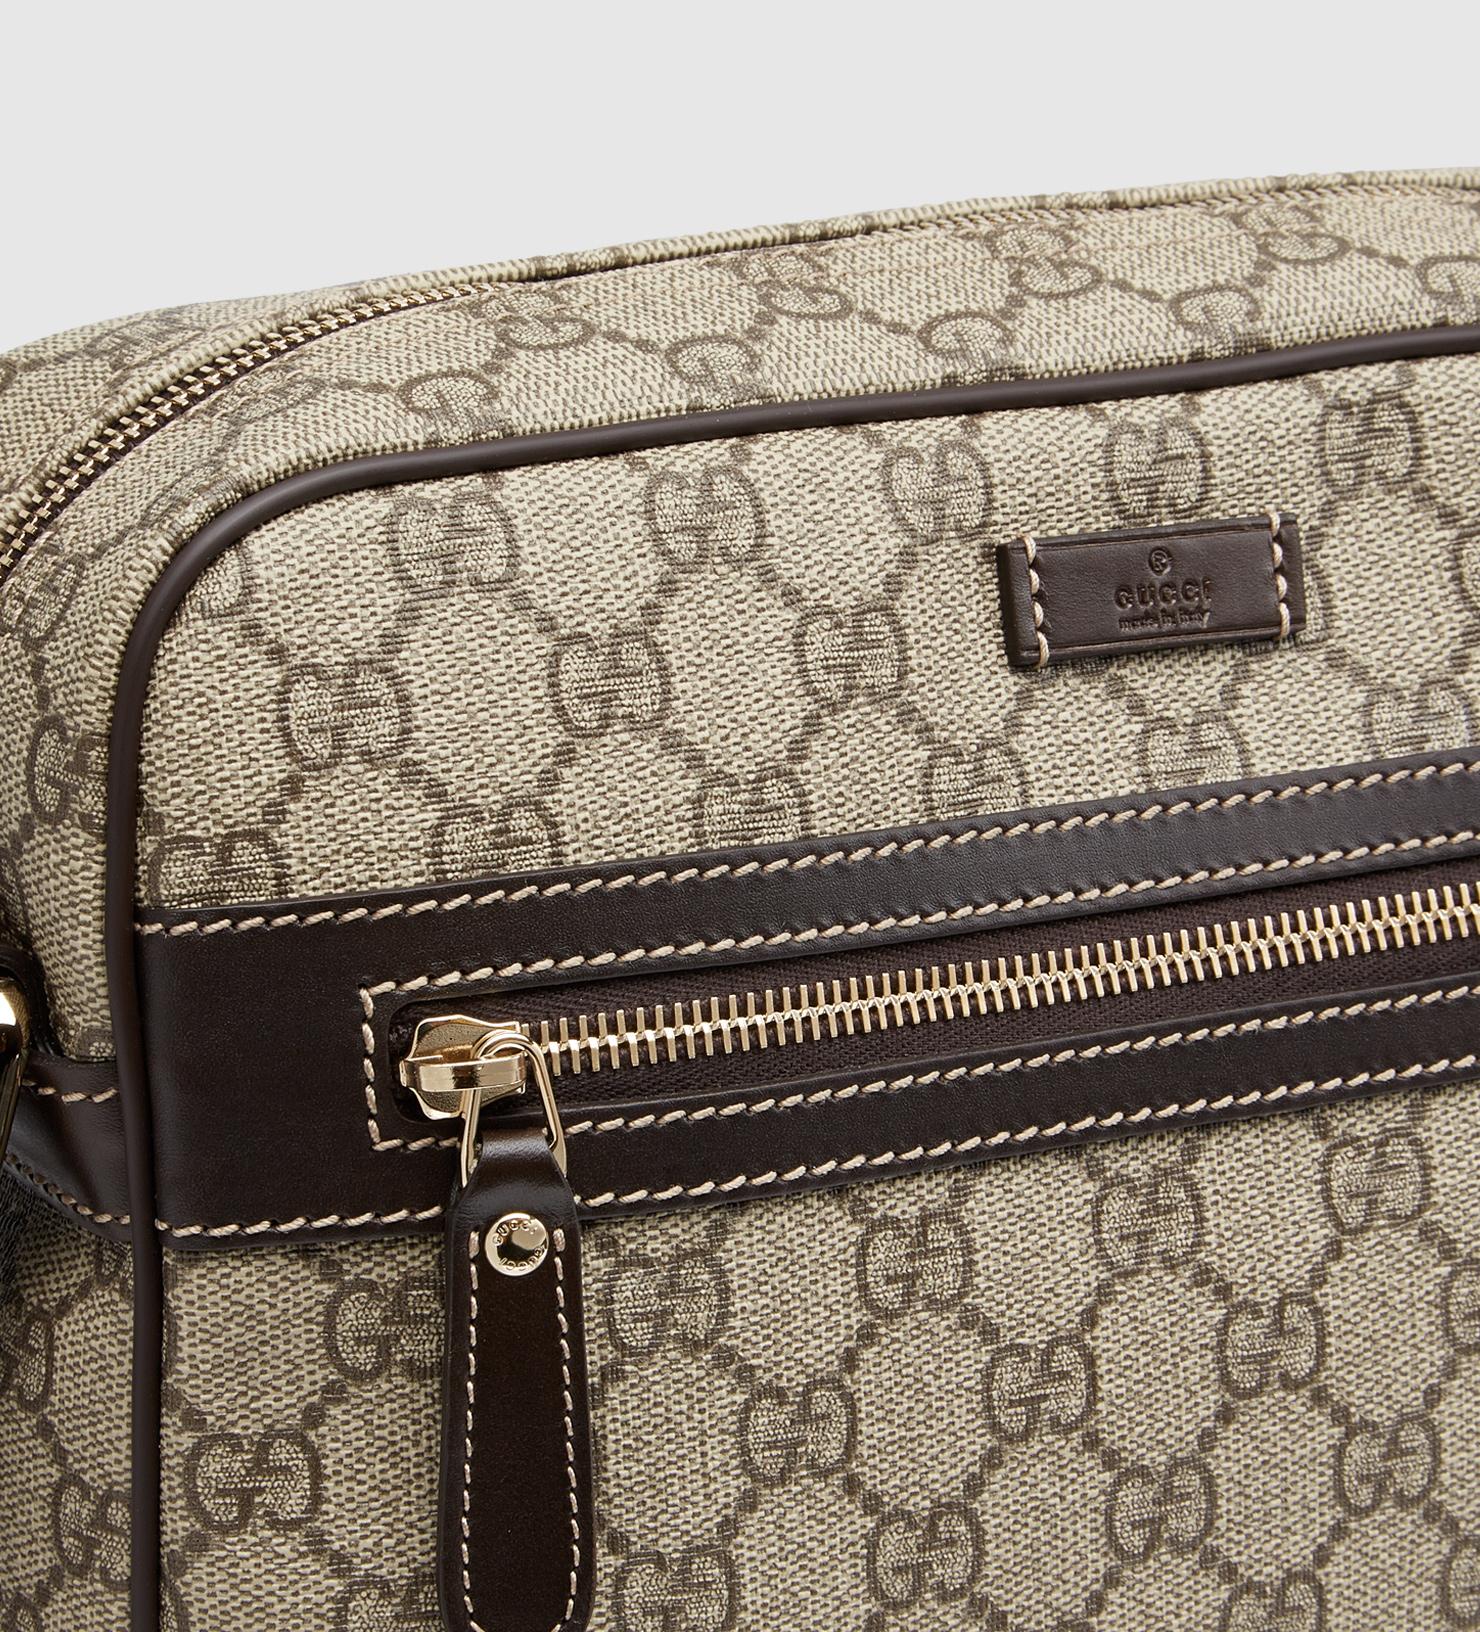 2f2e8ea0a838 Gucci Gg Supreme Shoulder Bag in Brown for Men - Lyst